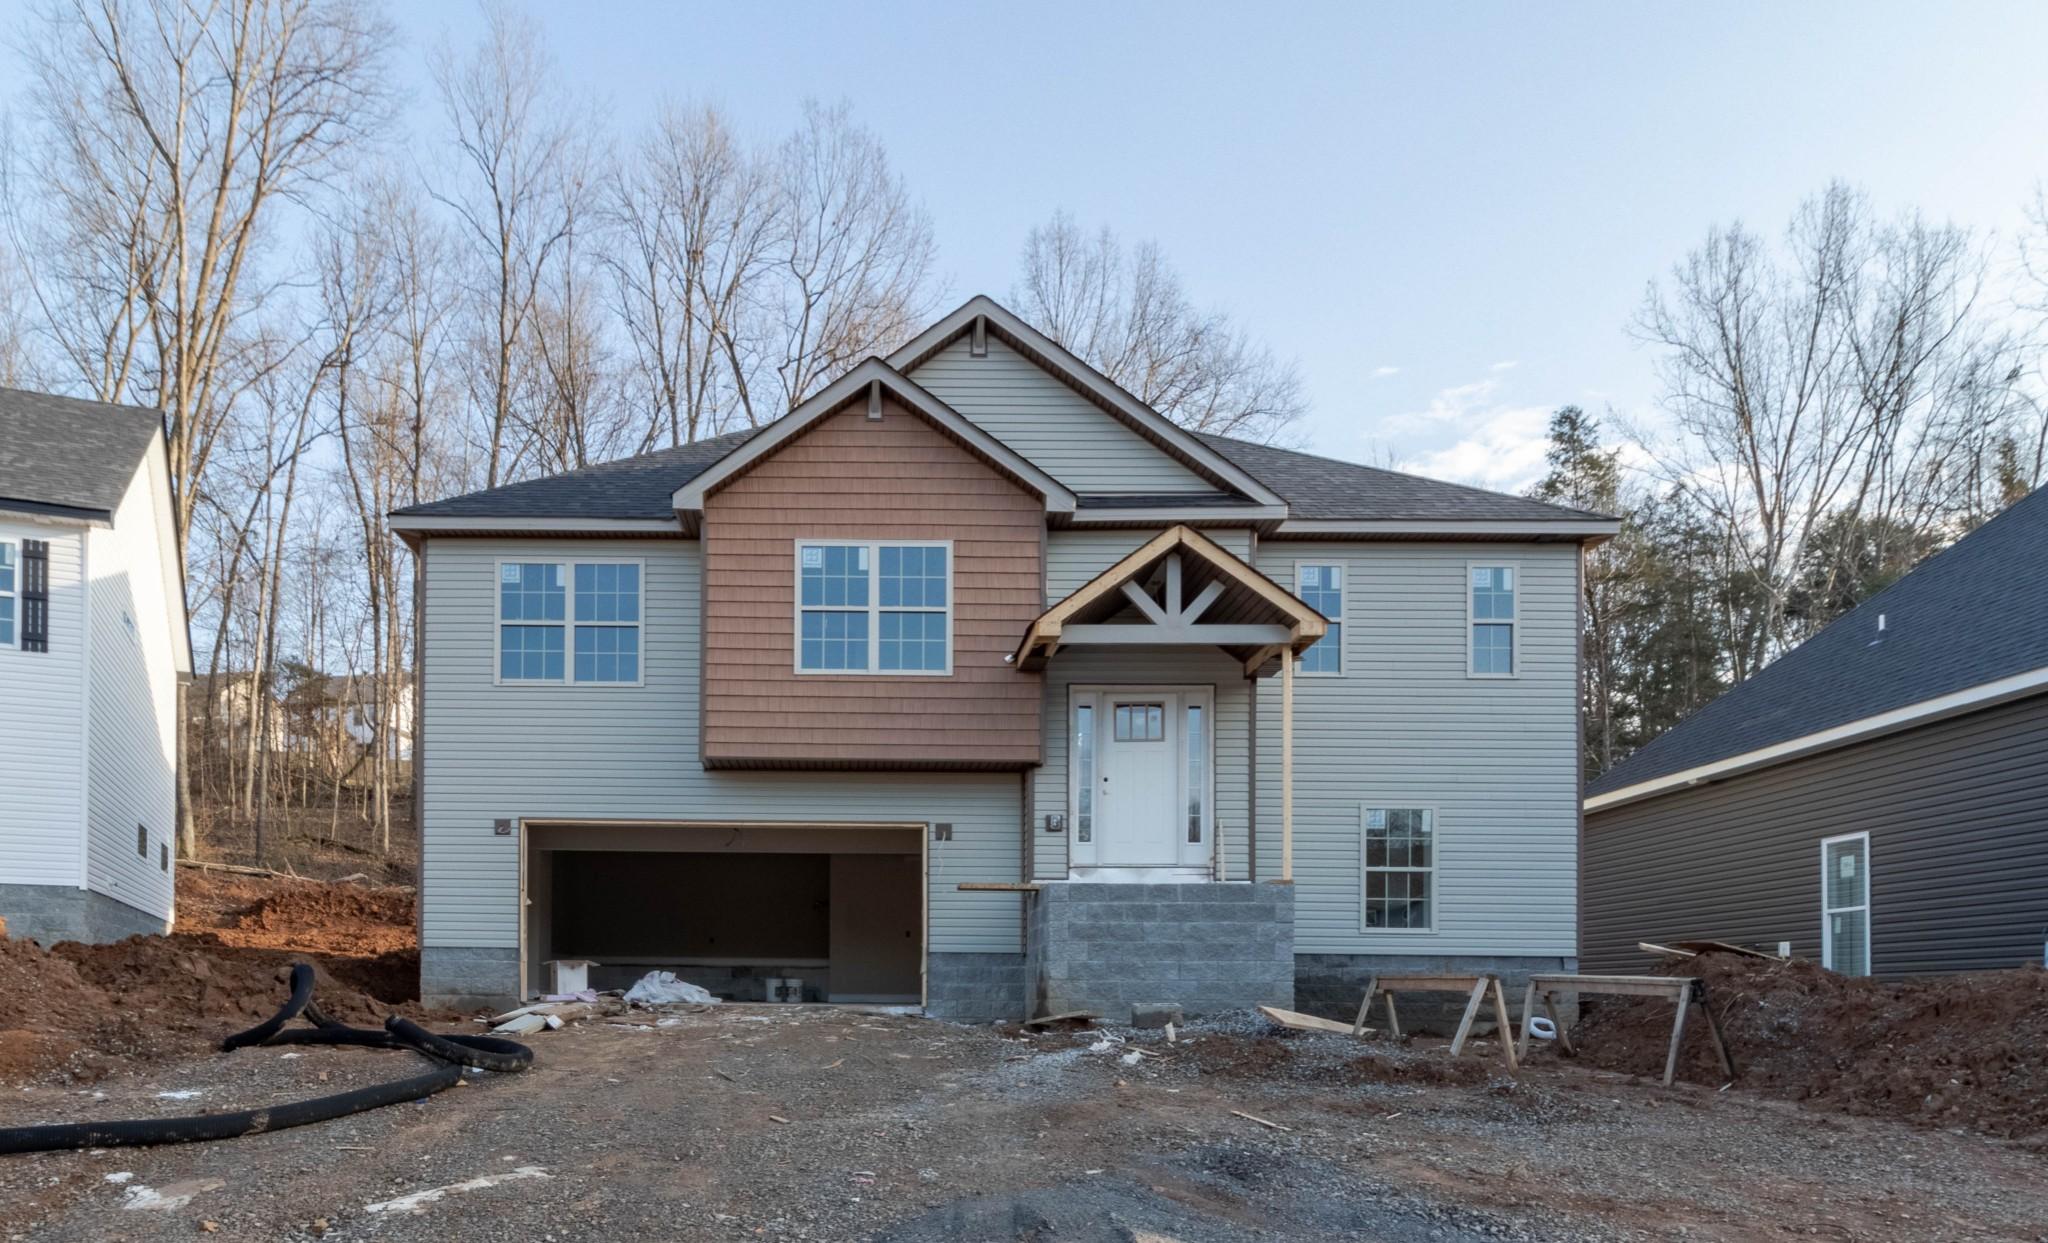 1660 Rains Rd, Clarksville, TN 37042 - Clarksville, TN real estate listing